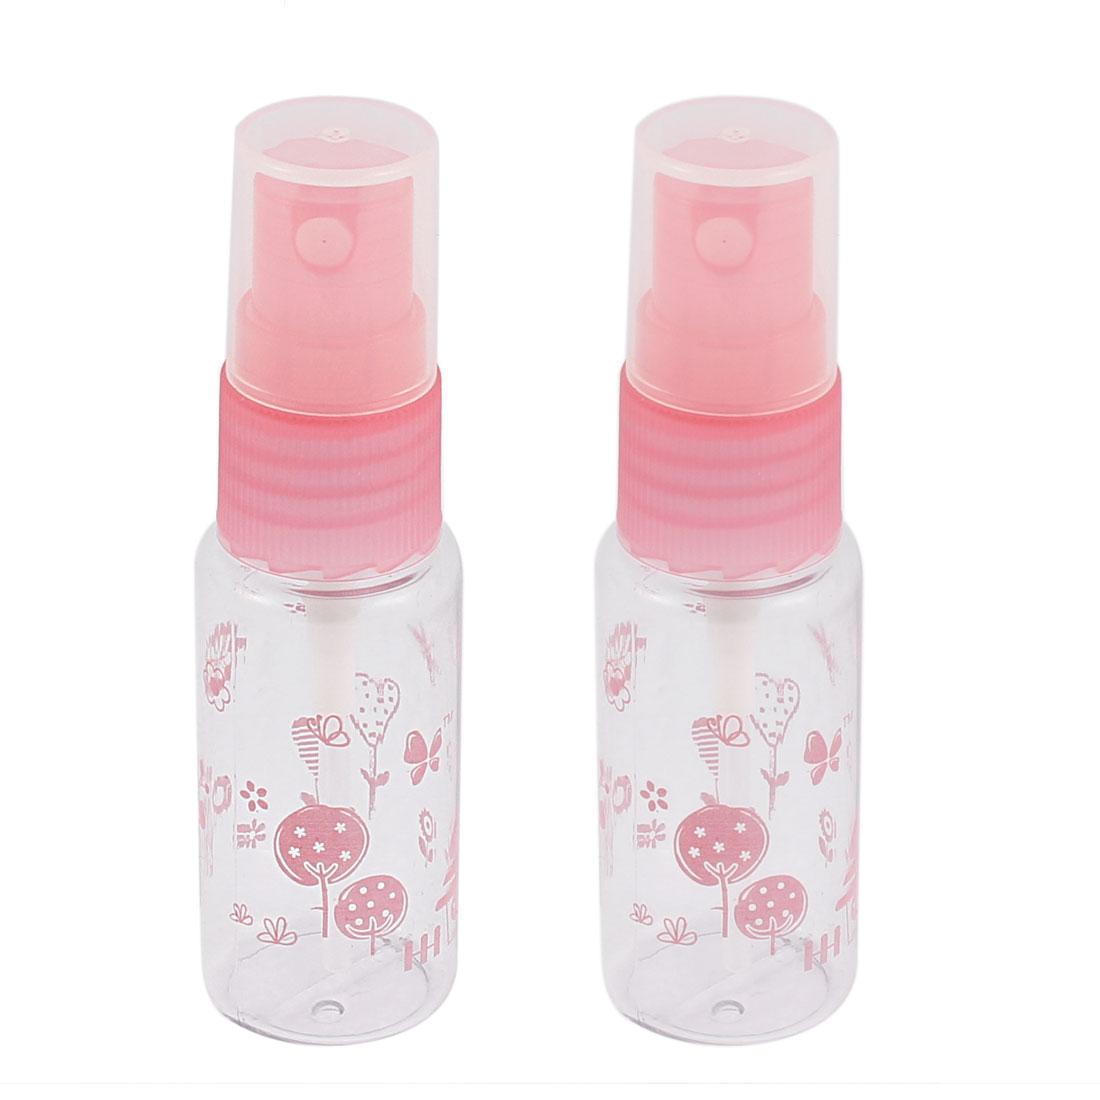 Plastic Cosmetic Perfume Liquid Container Spray Bottles 15ml Pink 2pcs